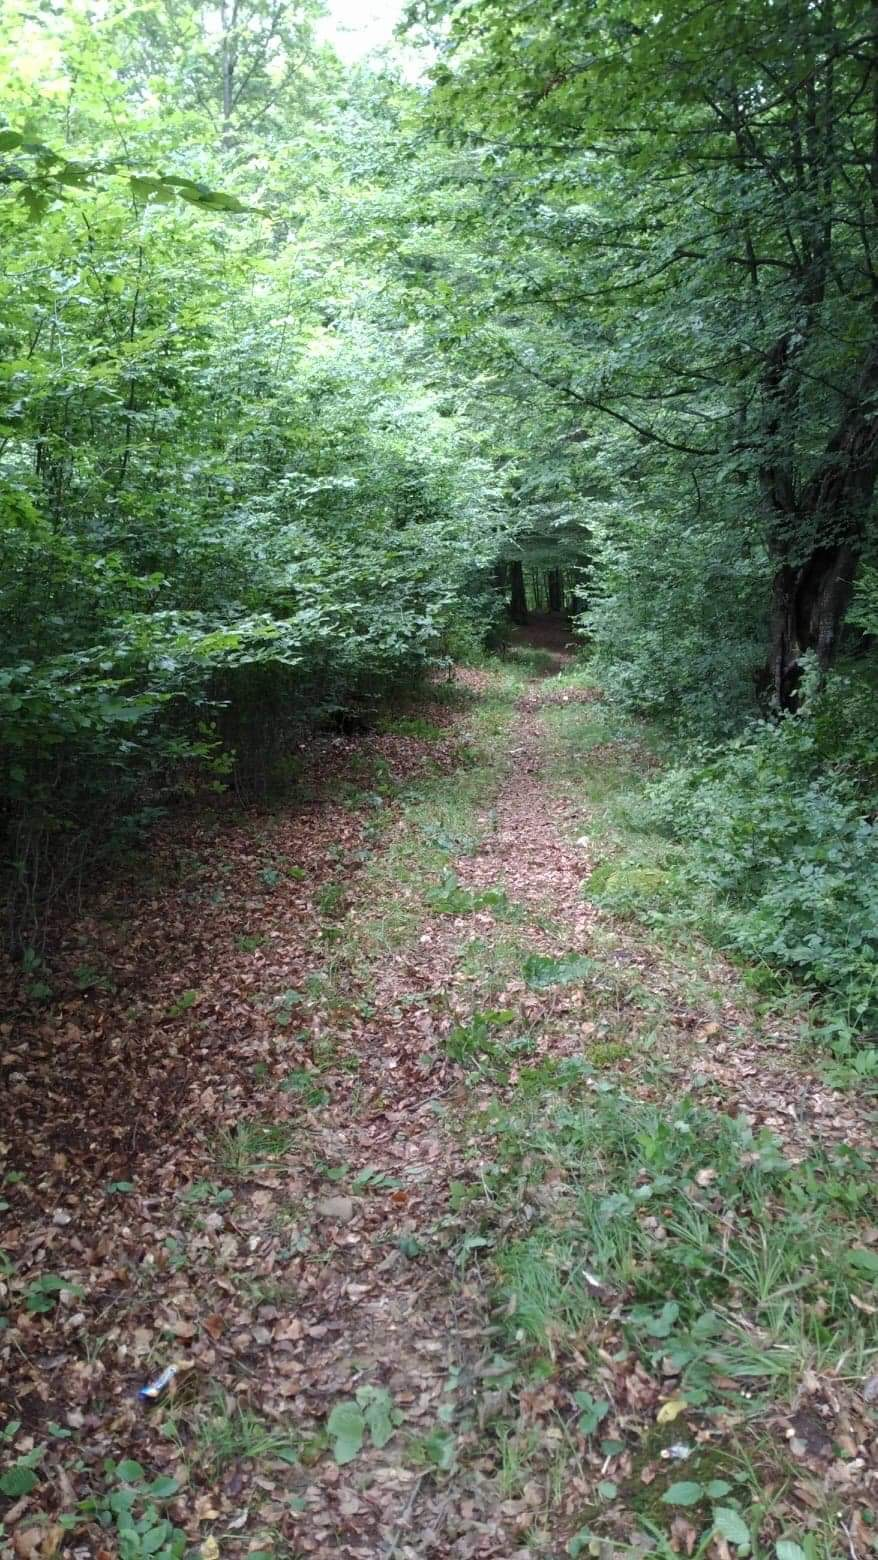 Trail%20through%20the%20forest original